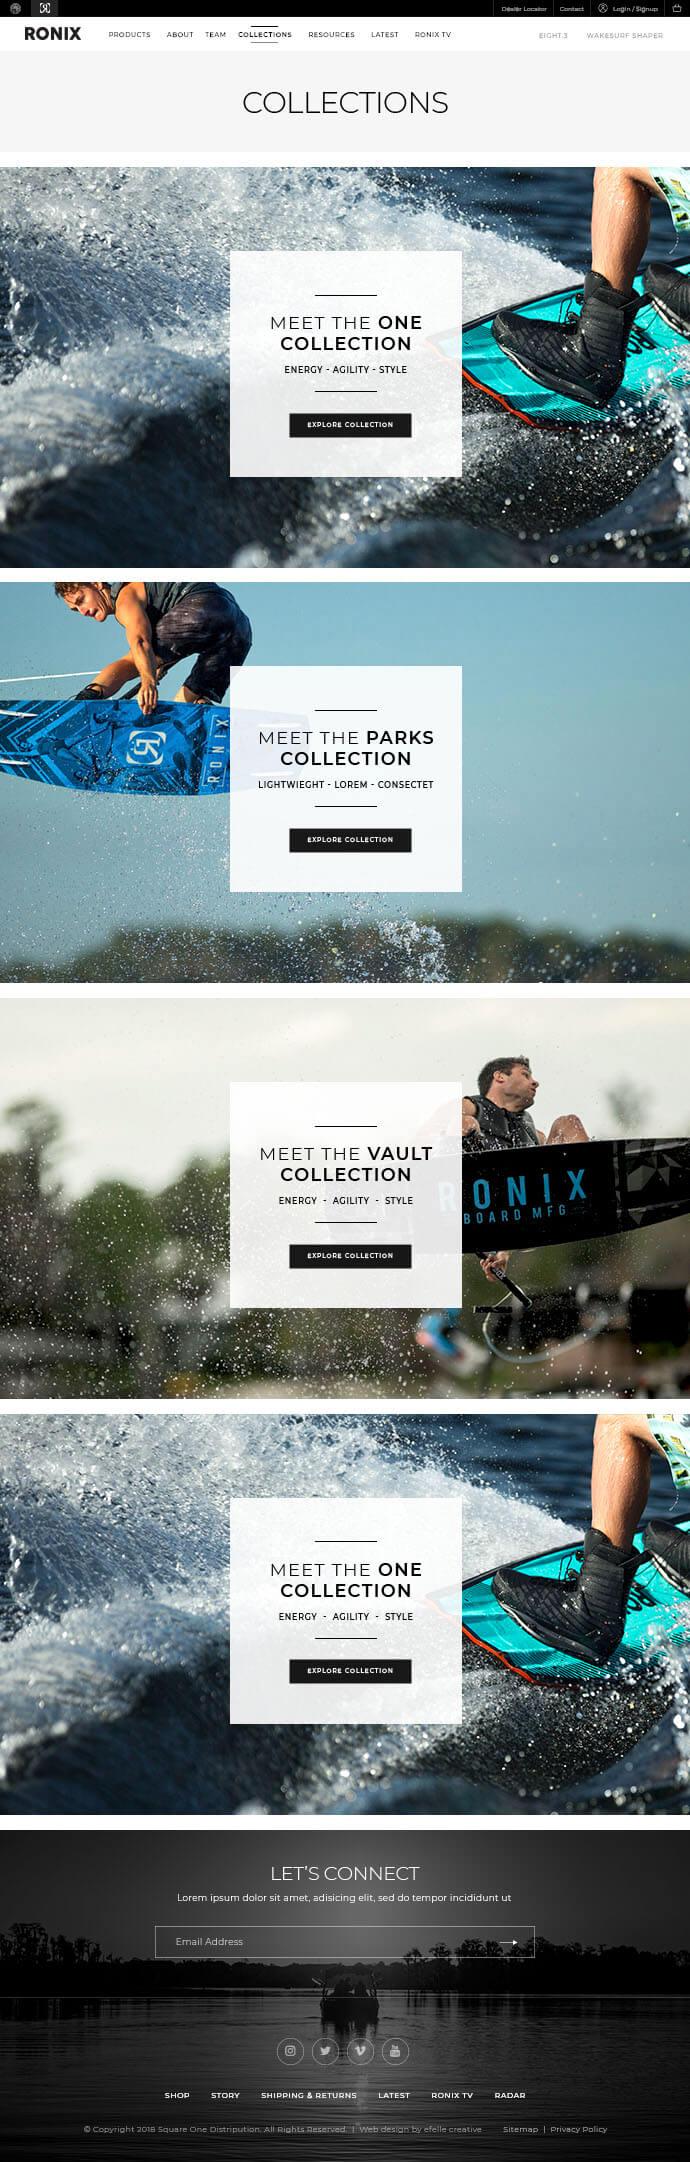 Ronix Wakeboards : efelle creative, Seattle, WA